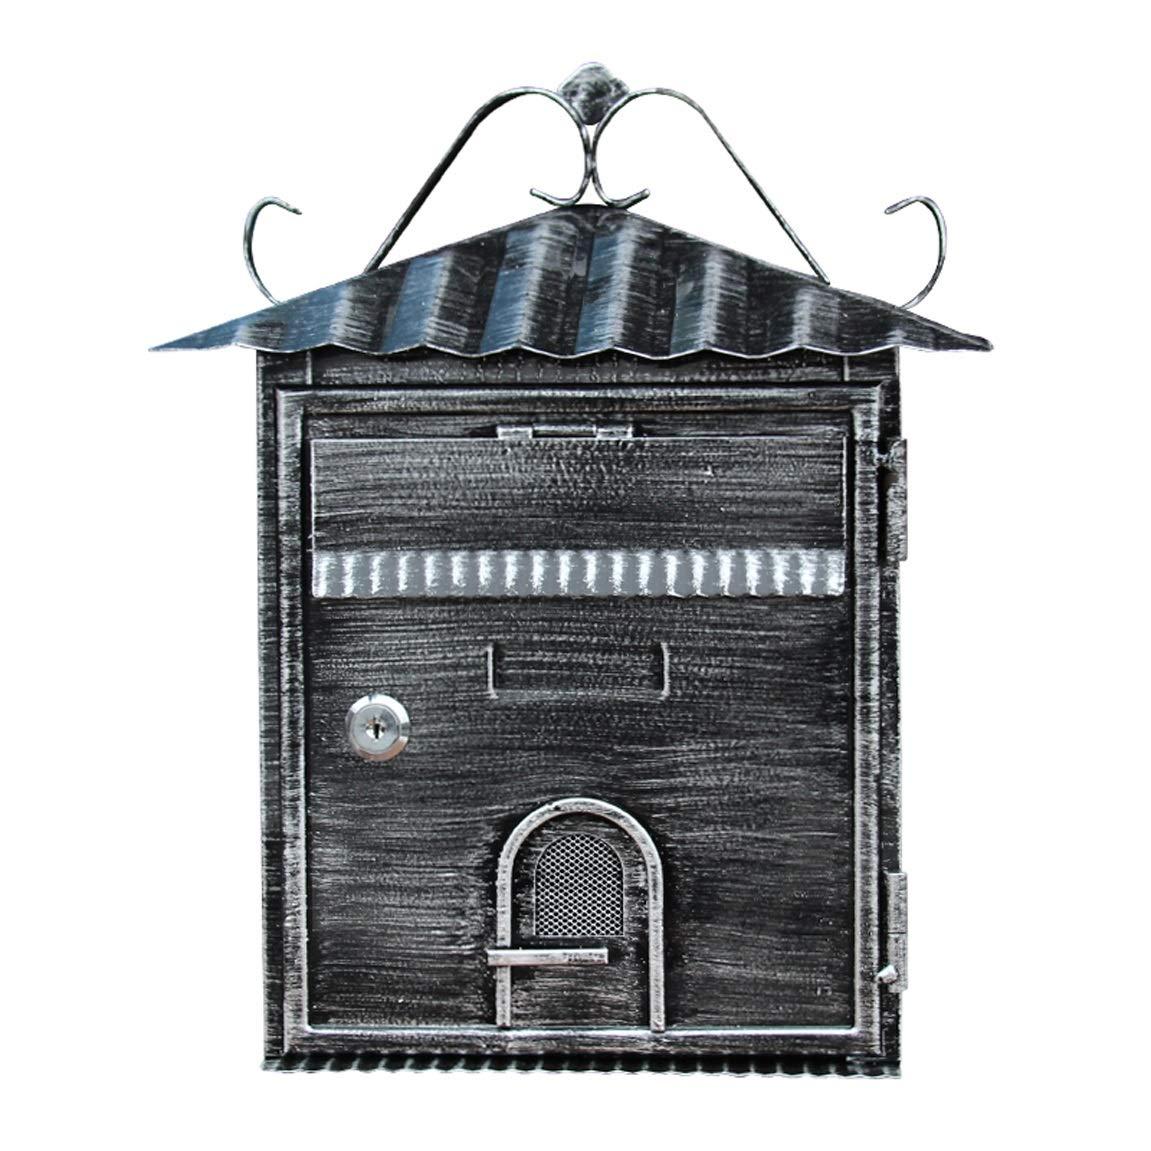 HZB ヨーロッパスタイルのヴィラ郵便受け屋外レシートボックス、レトロボックス、レターボックス、壁掛けの提案箱   B07F1NC1LP